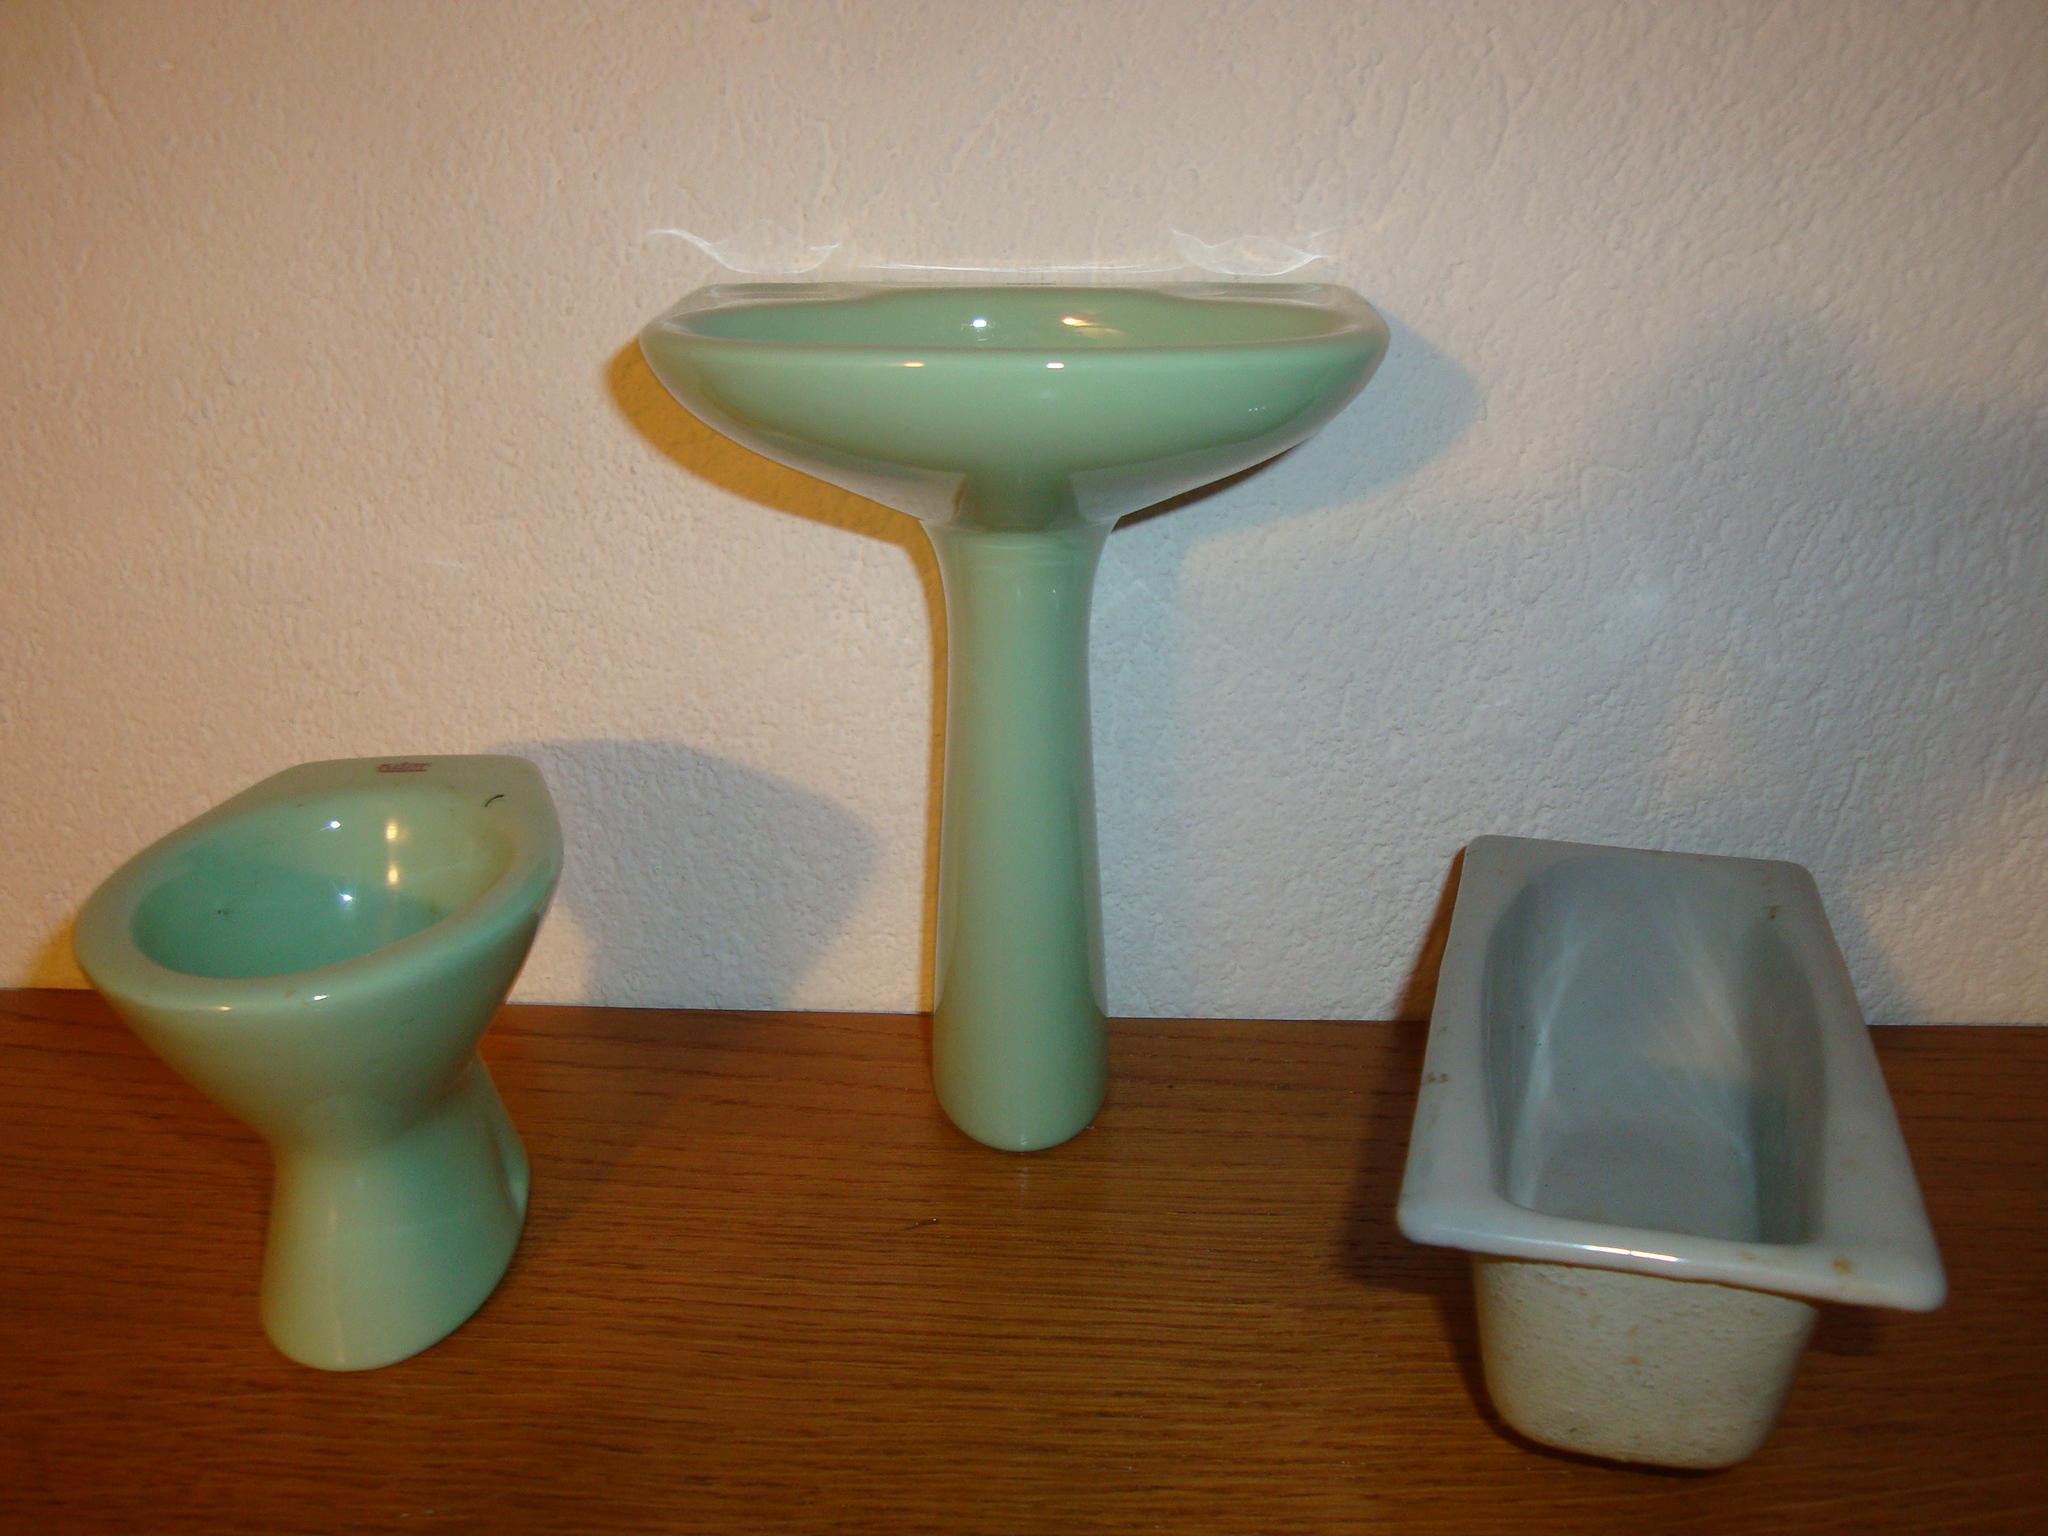 Sanitaire miniature Selles